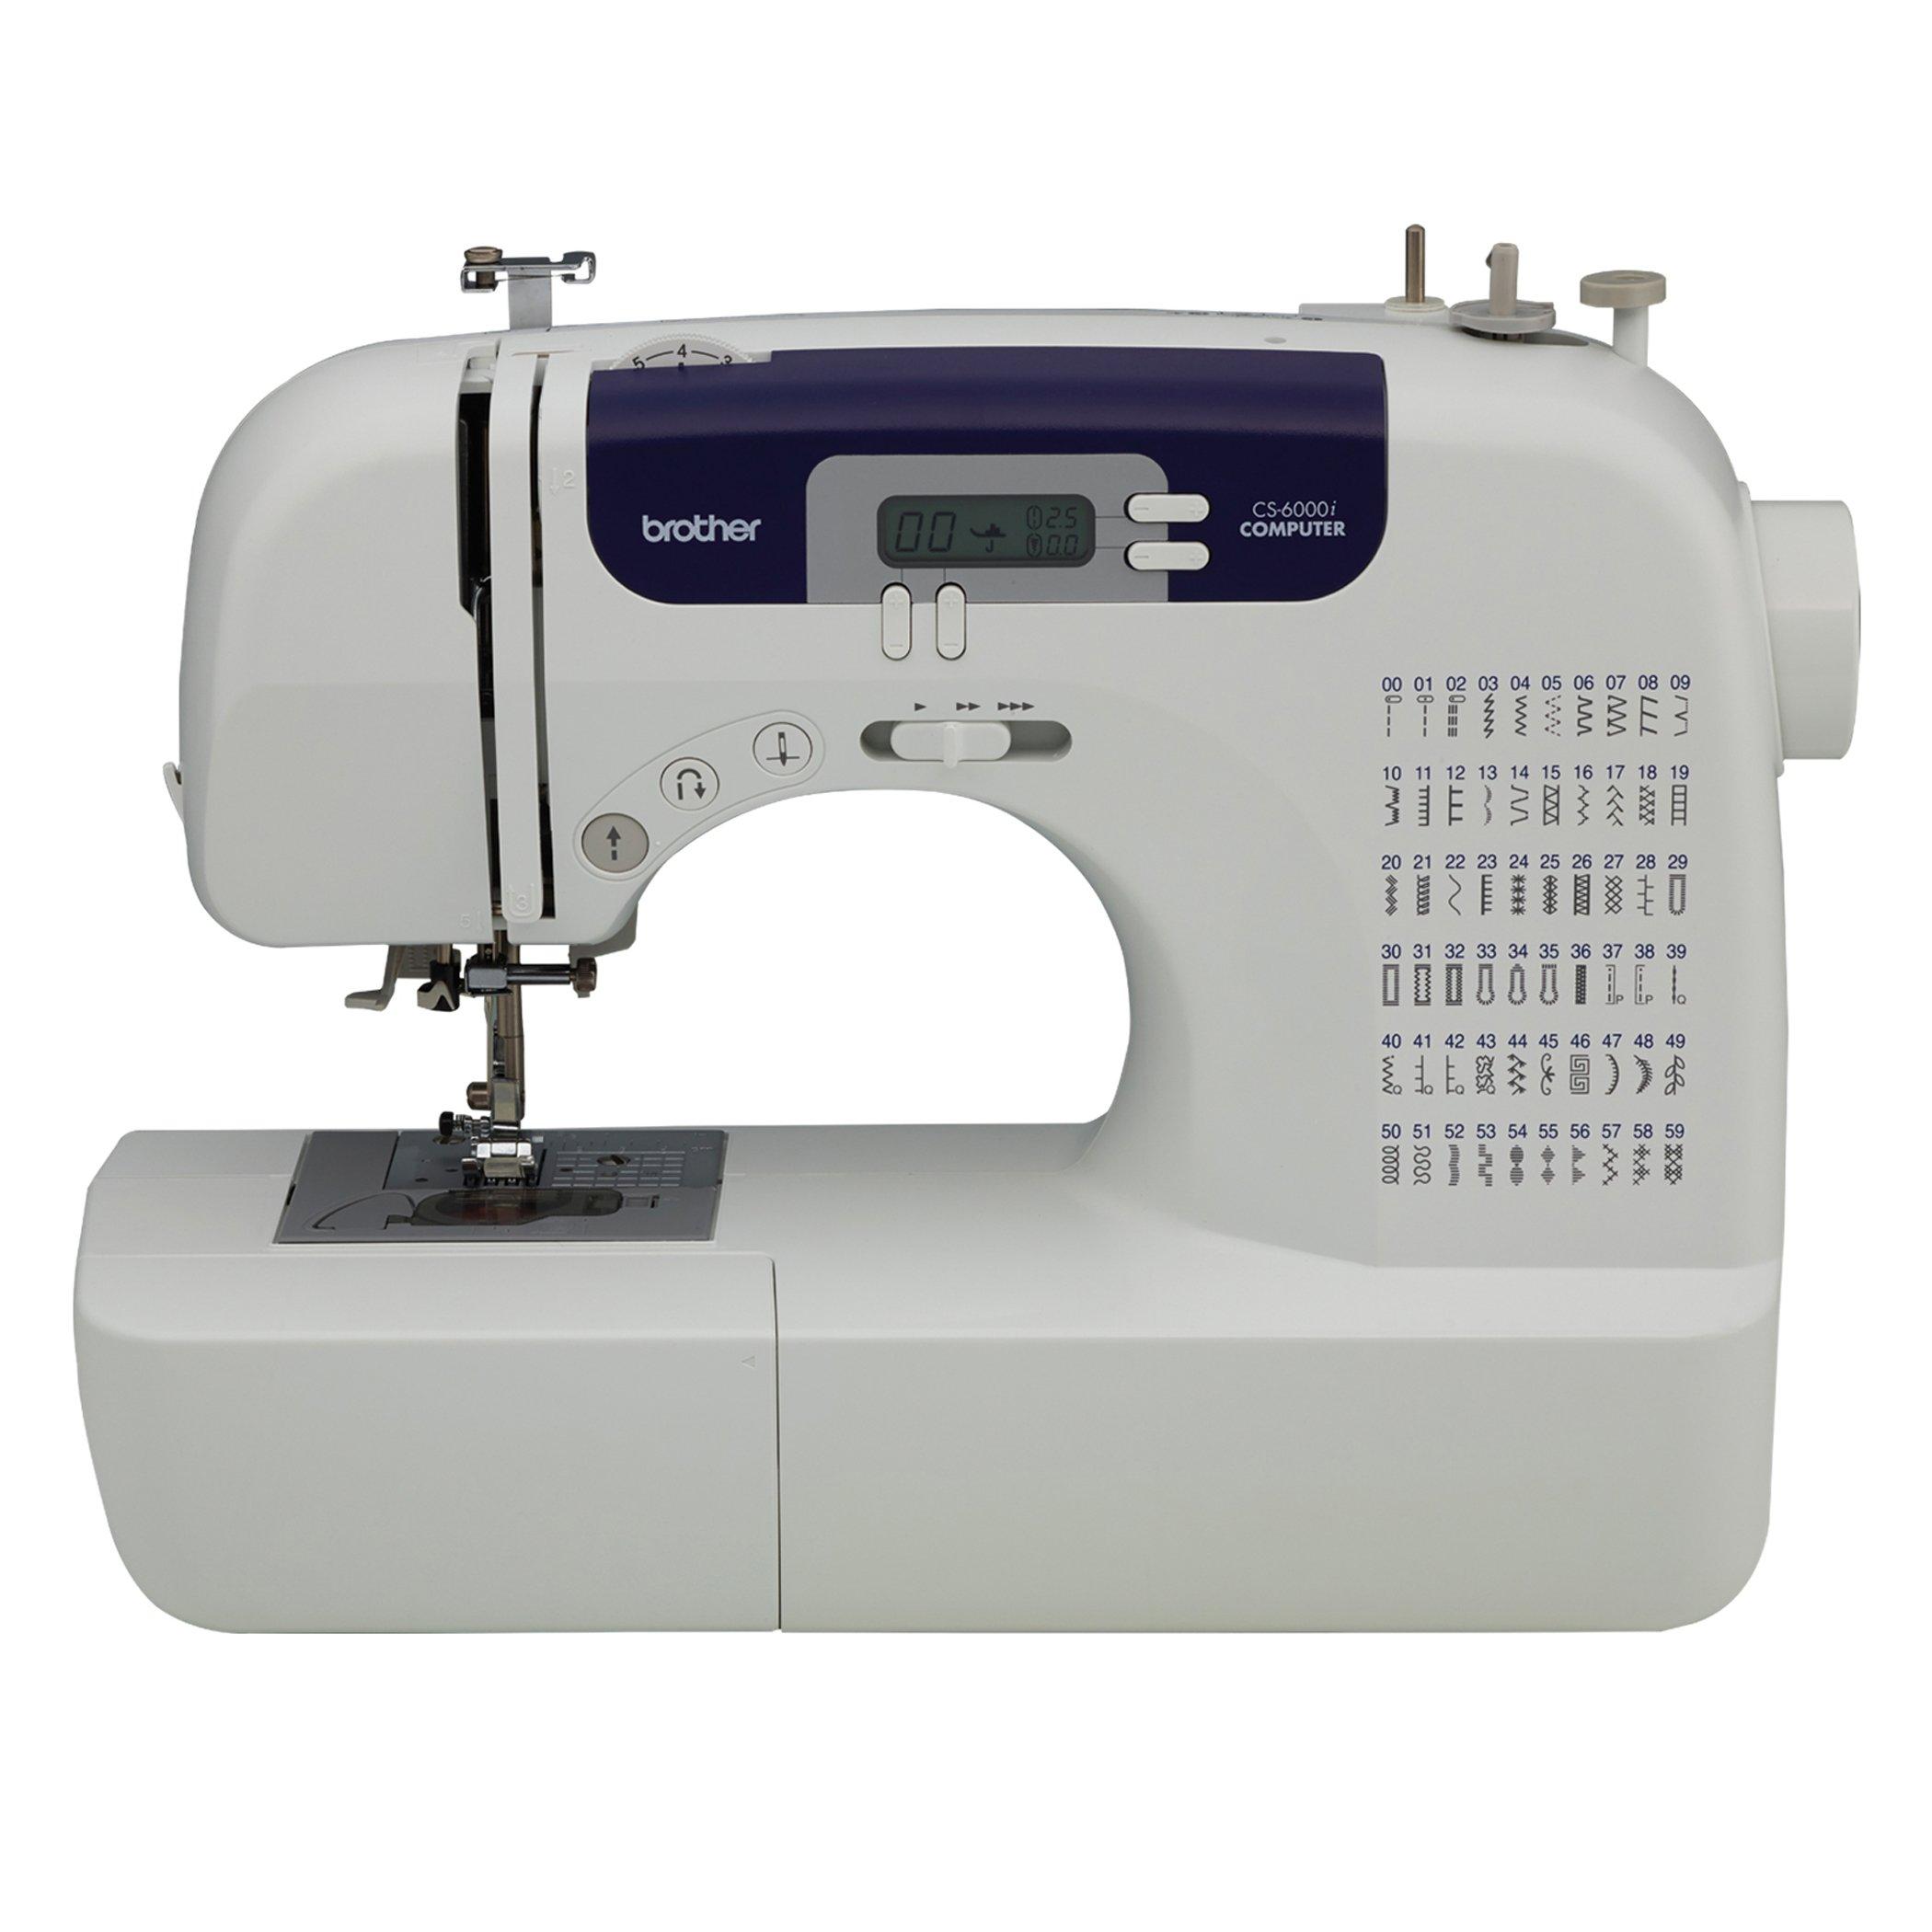 Best sewing machine for children | Amazon.com